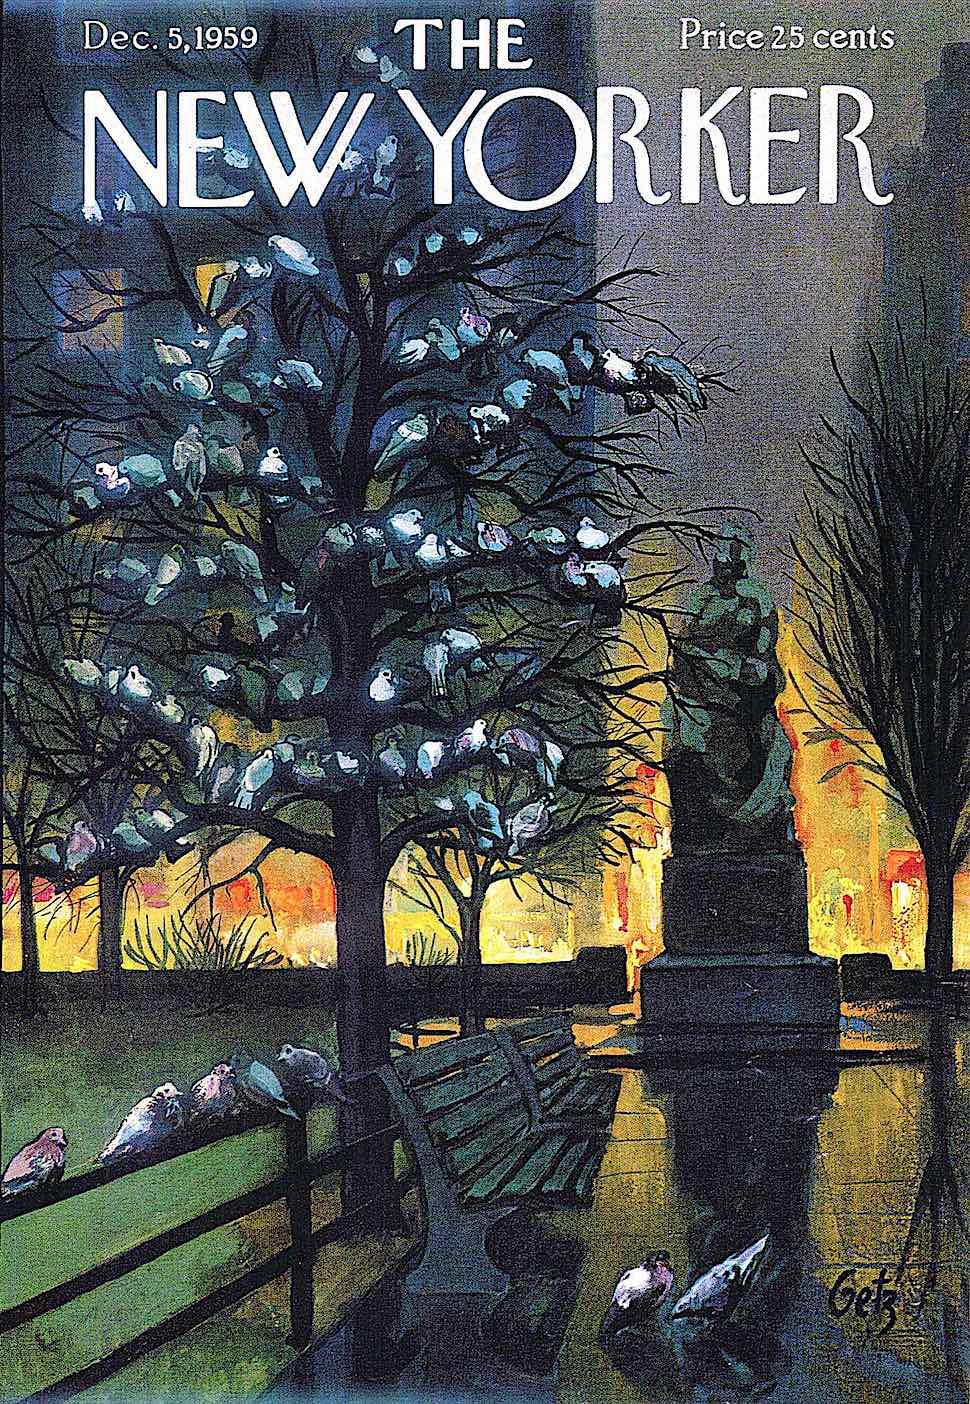 a 1959 Arthur Getz illustration of New York at night